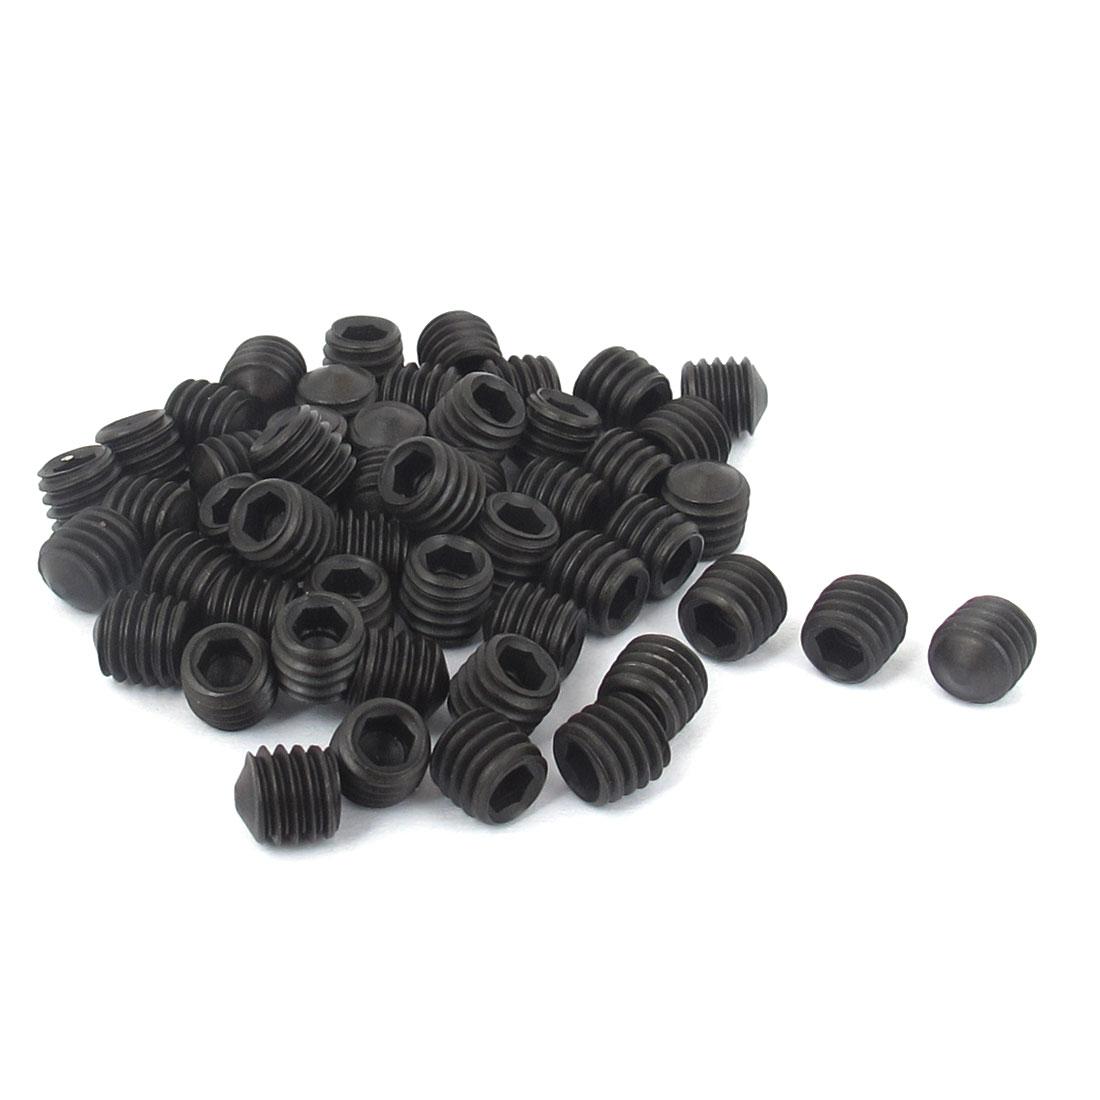 M6x6mm 12.9 Alloy Steel Hex Socket Set Cone Point Grub Screws 50pcs